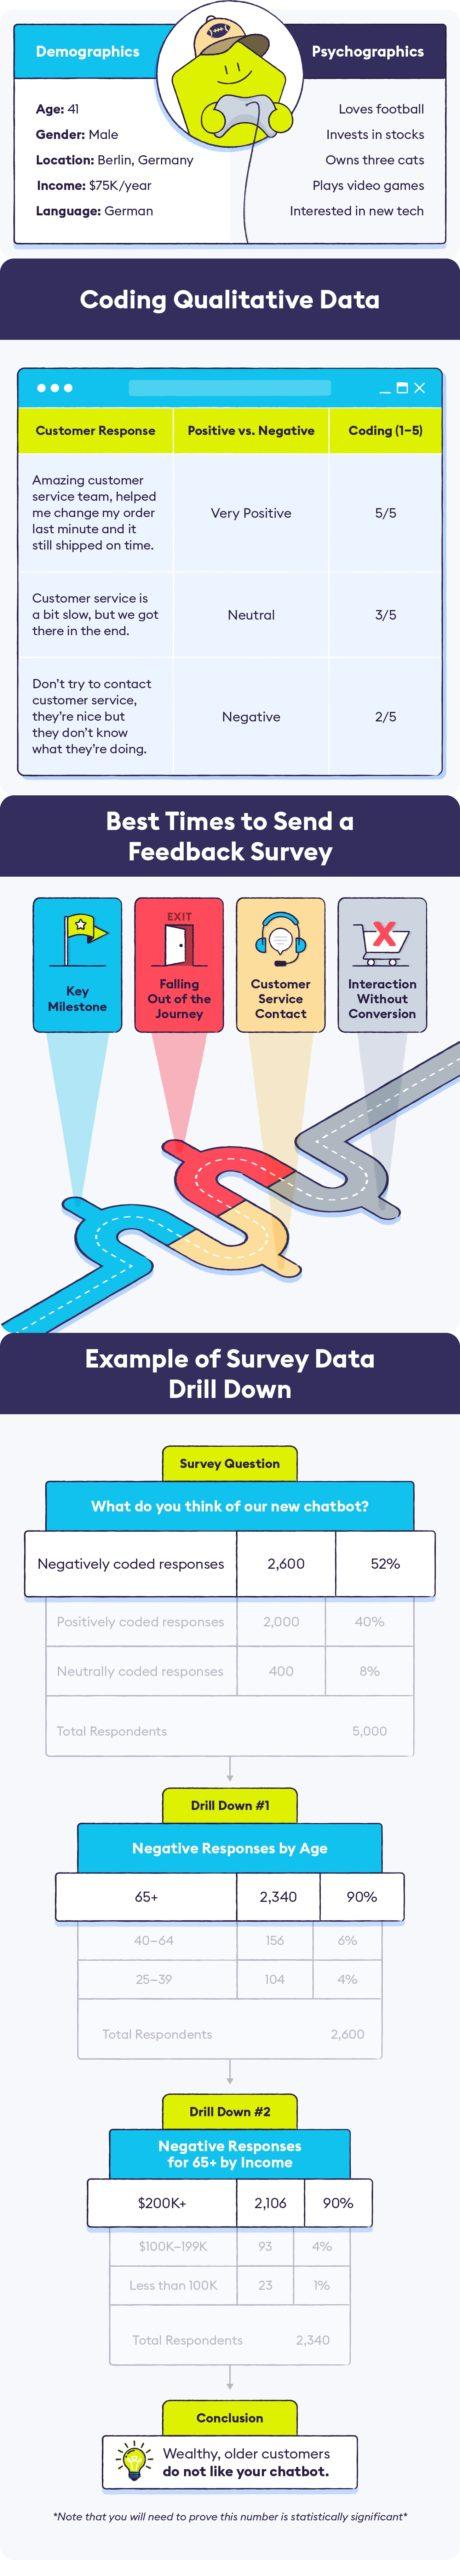 Customer survey data analysis Infographic Image